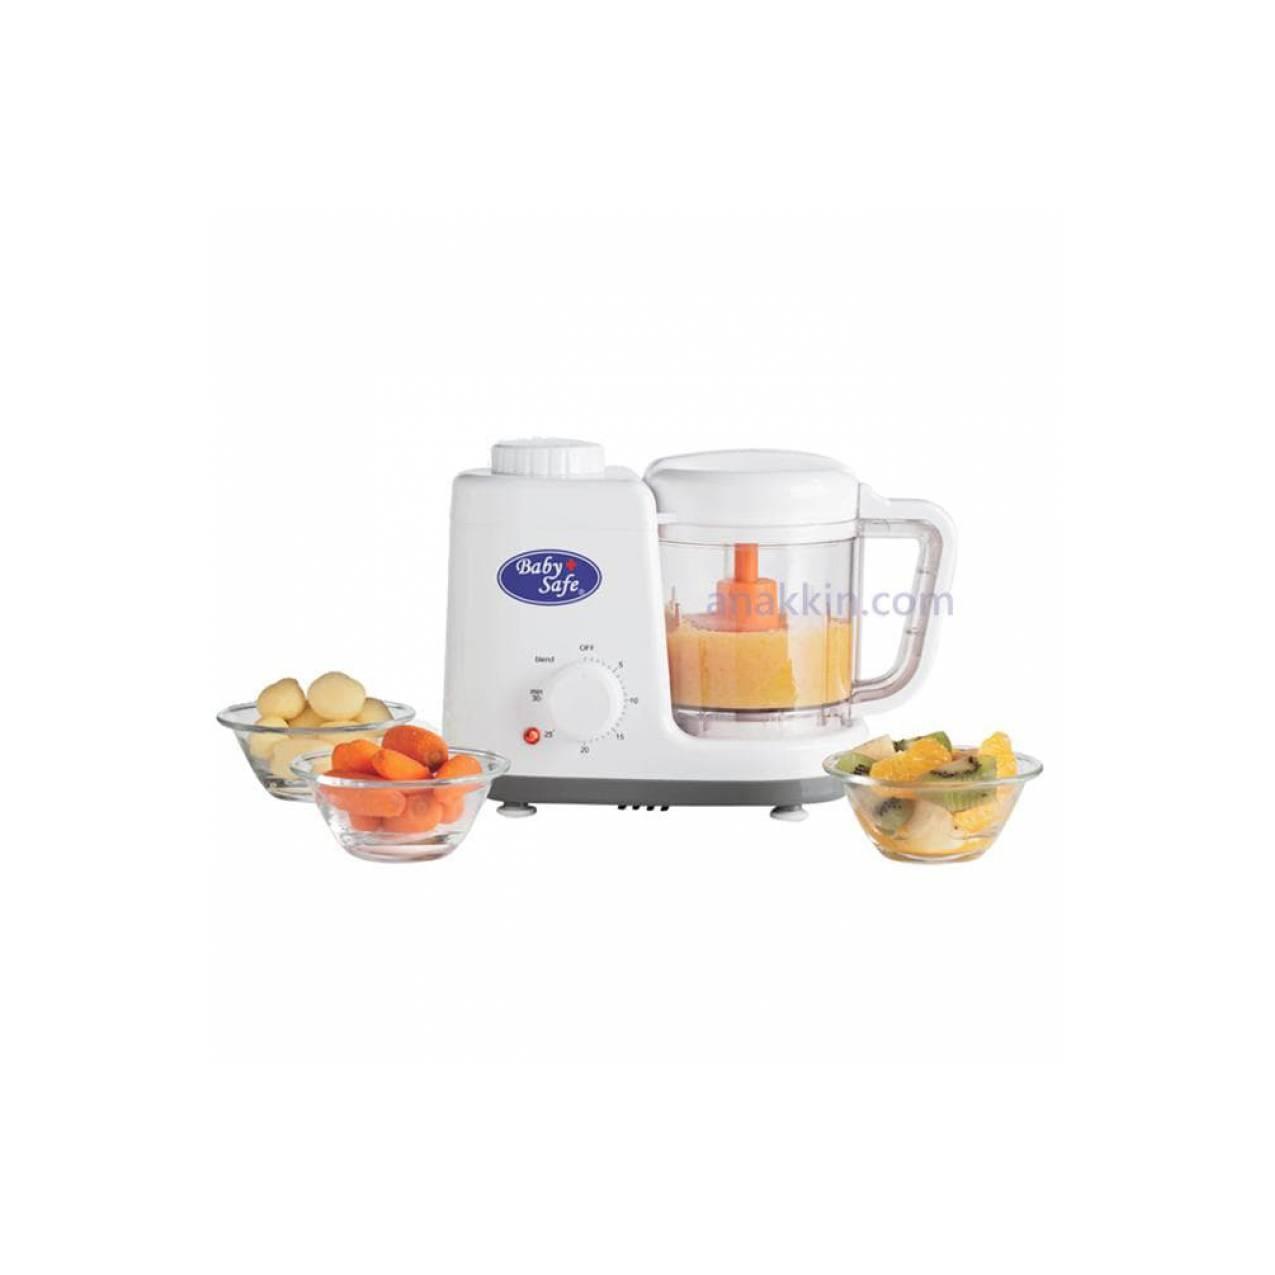 Promo Baby Safe Food Maker / Blender Murah / Pengukus Makanan Bayi